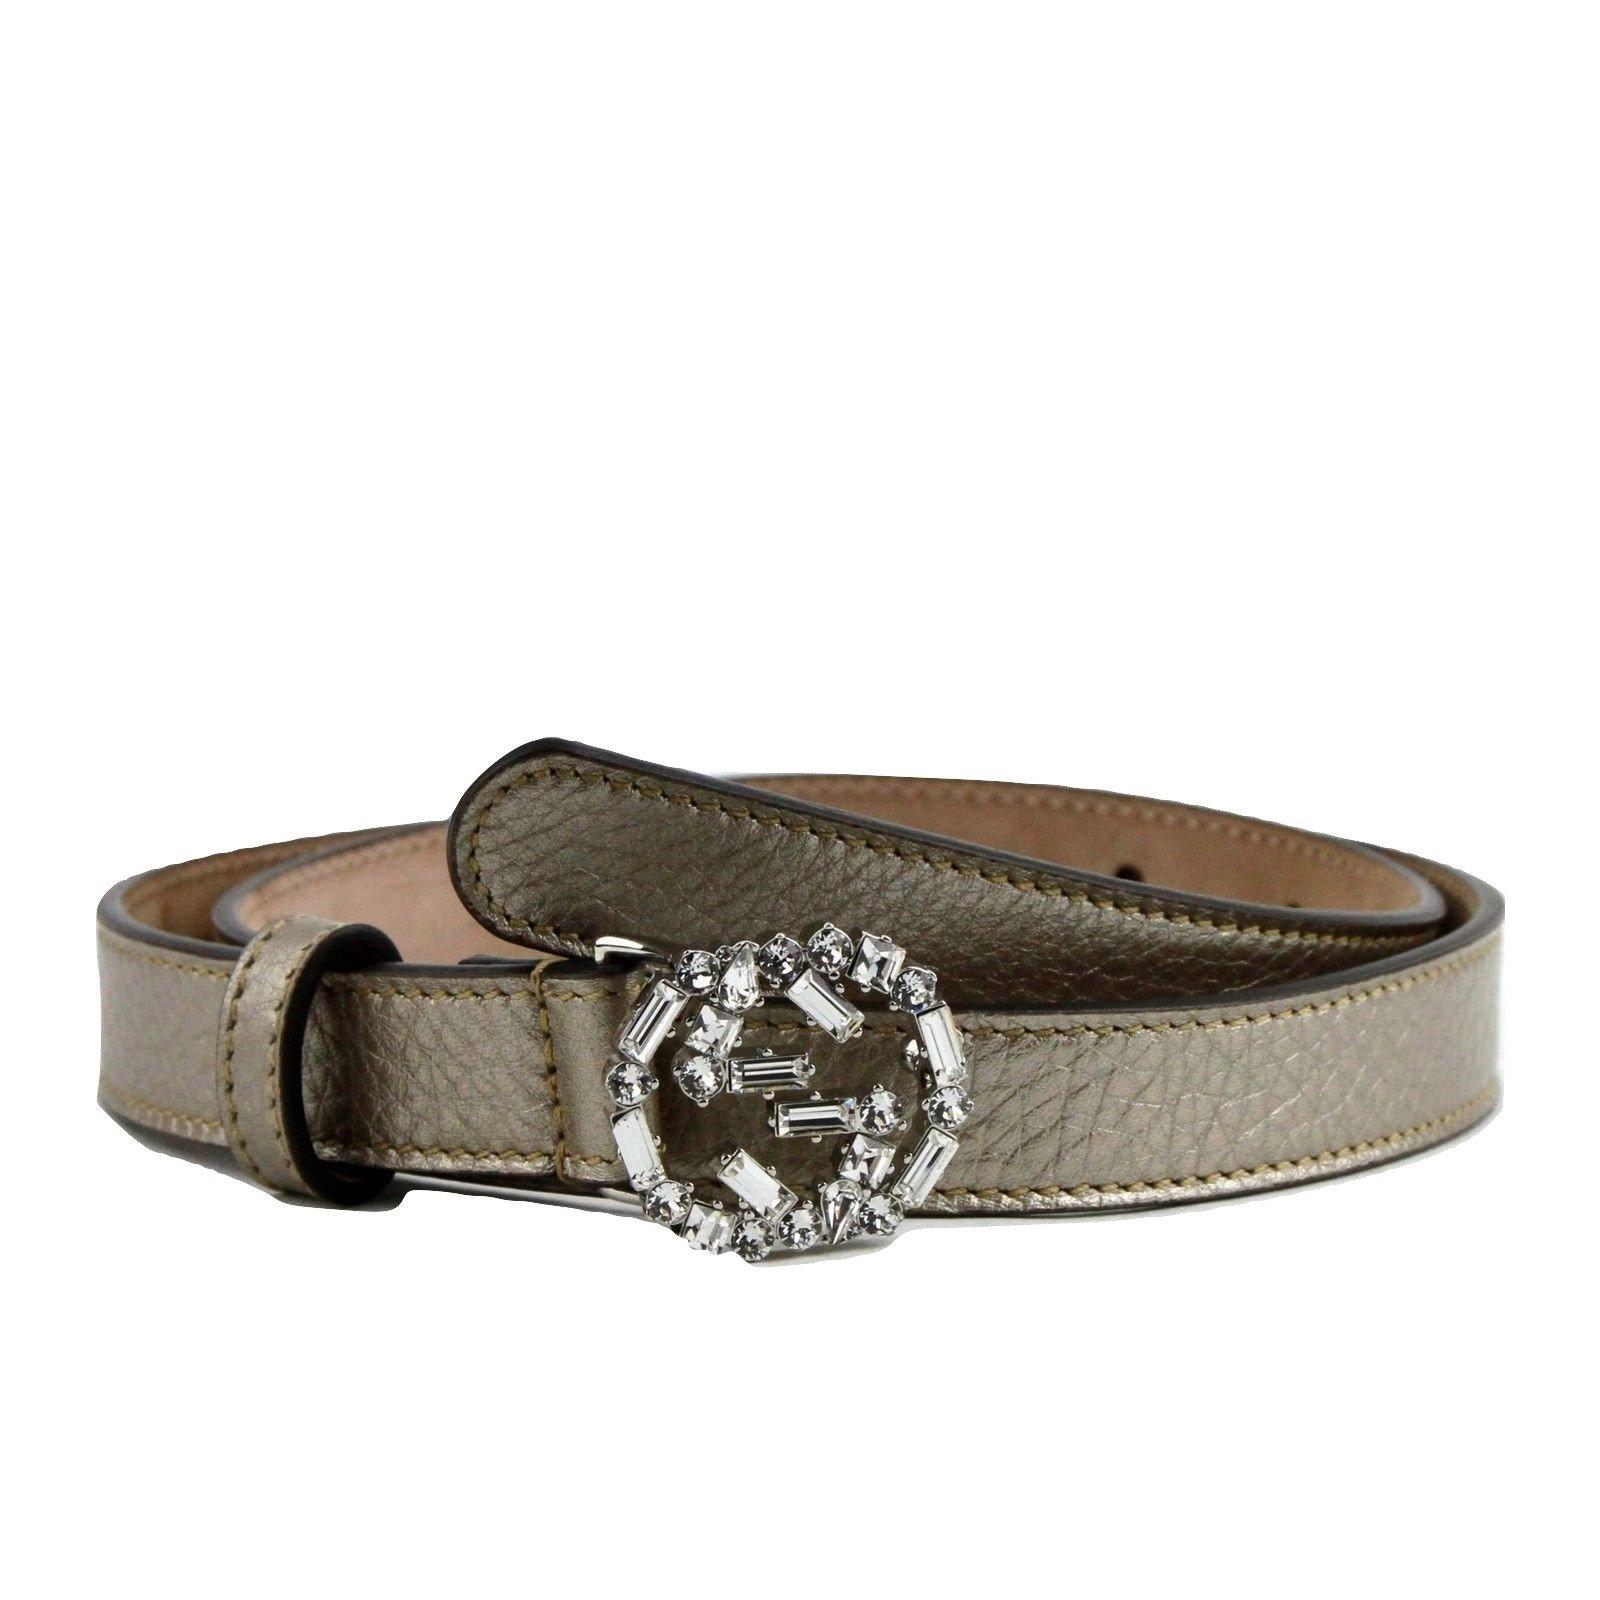 Gucci Women's Interlocking Crystal G Leather Skinny Belt 354380 (80 / 32, Metallic Beige)